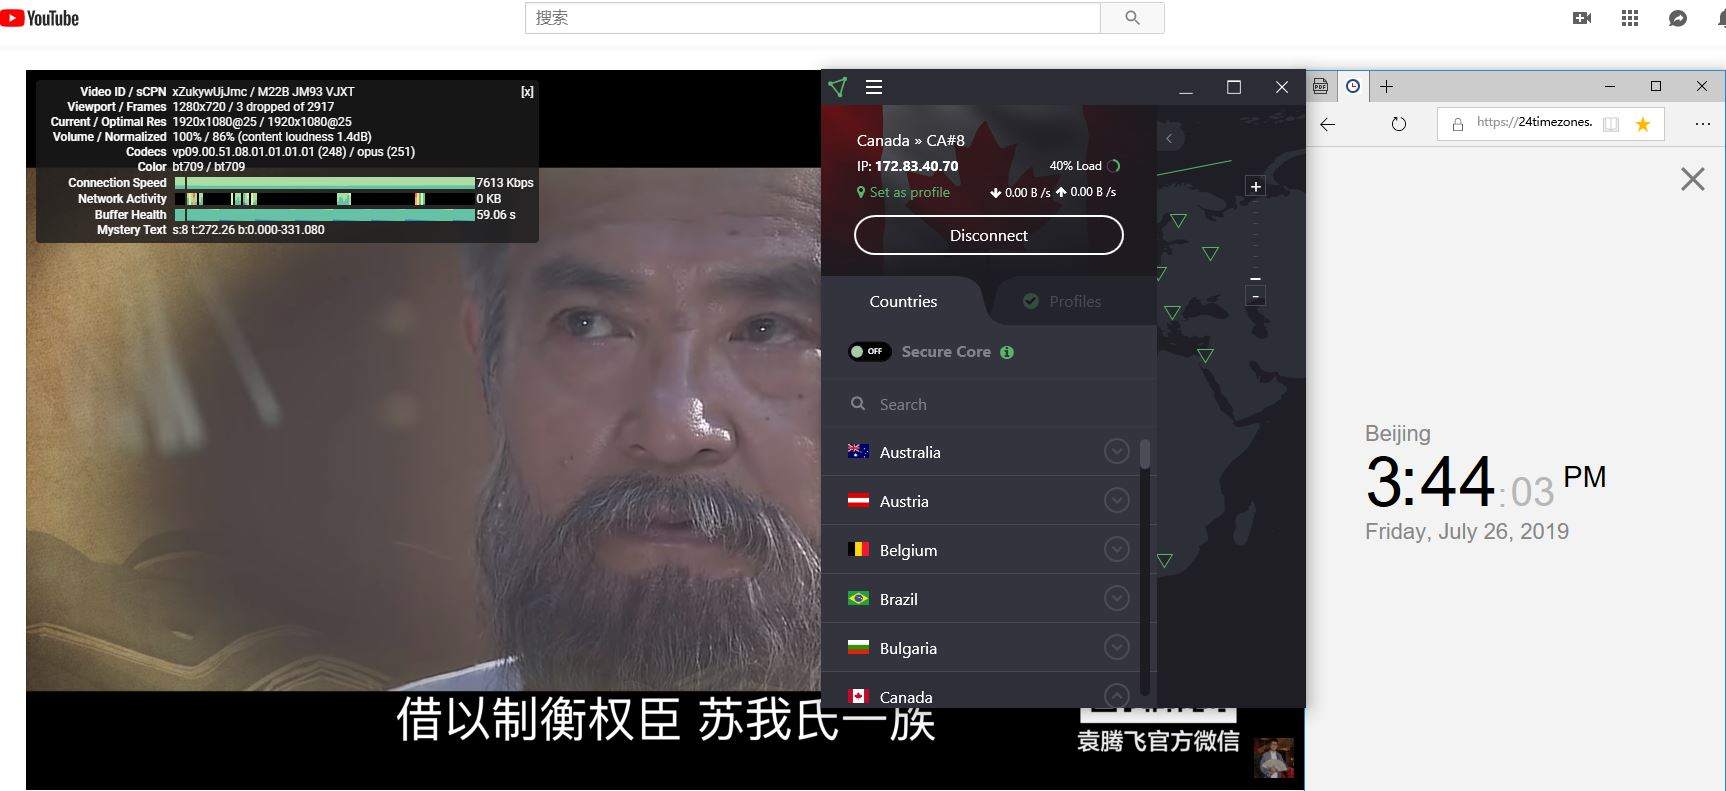 protonVPN Windows 中国翻墙 科学上网 ca-8服务器节点-YouTube-20190726